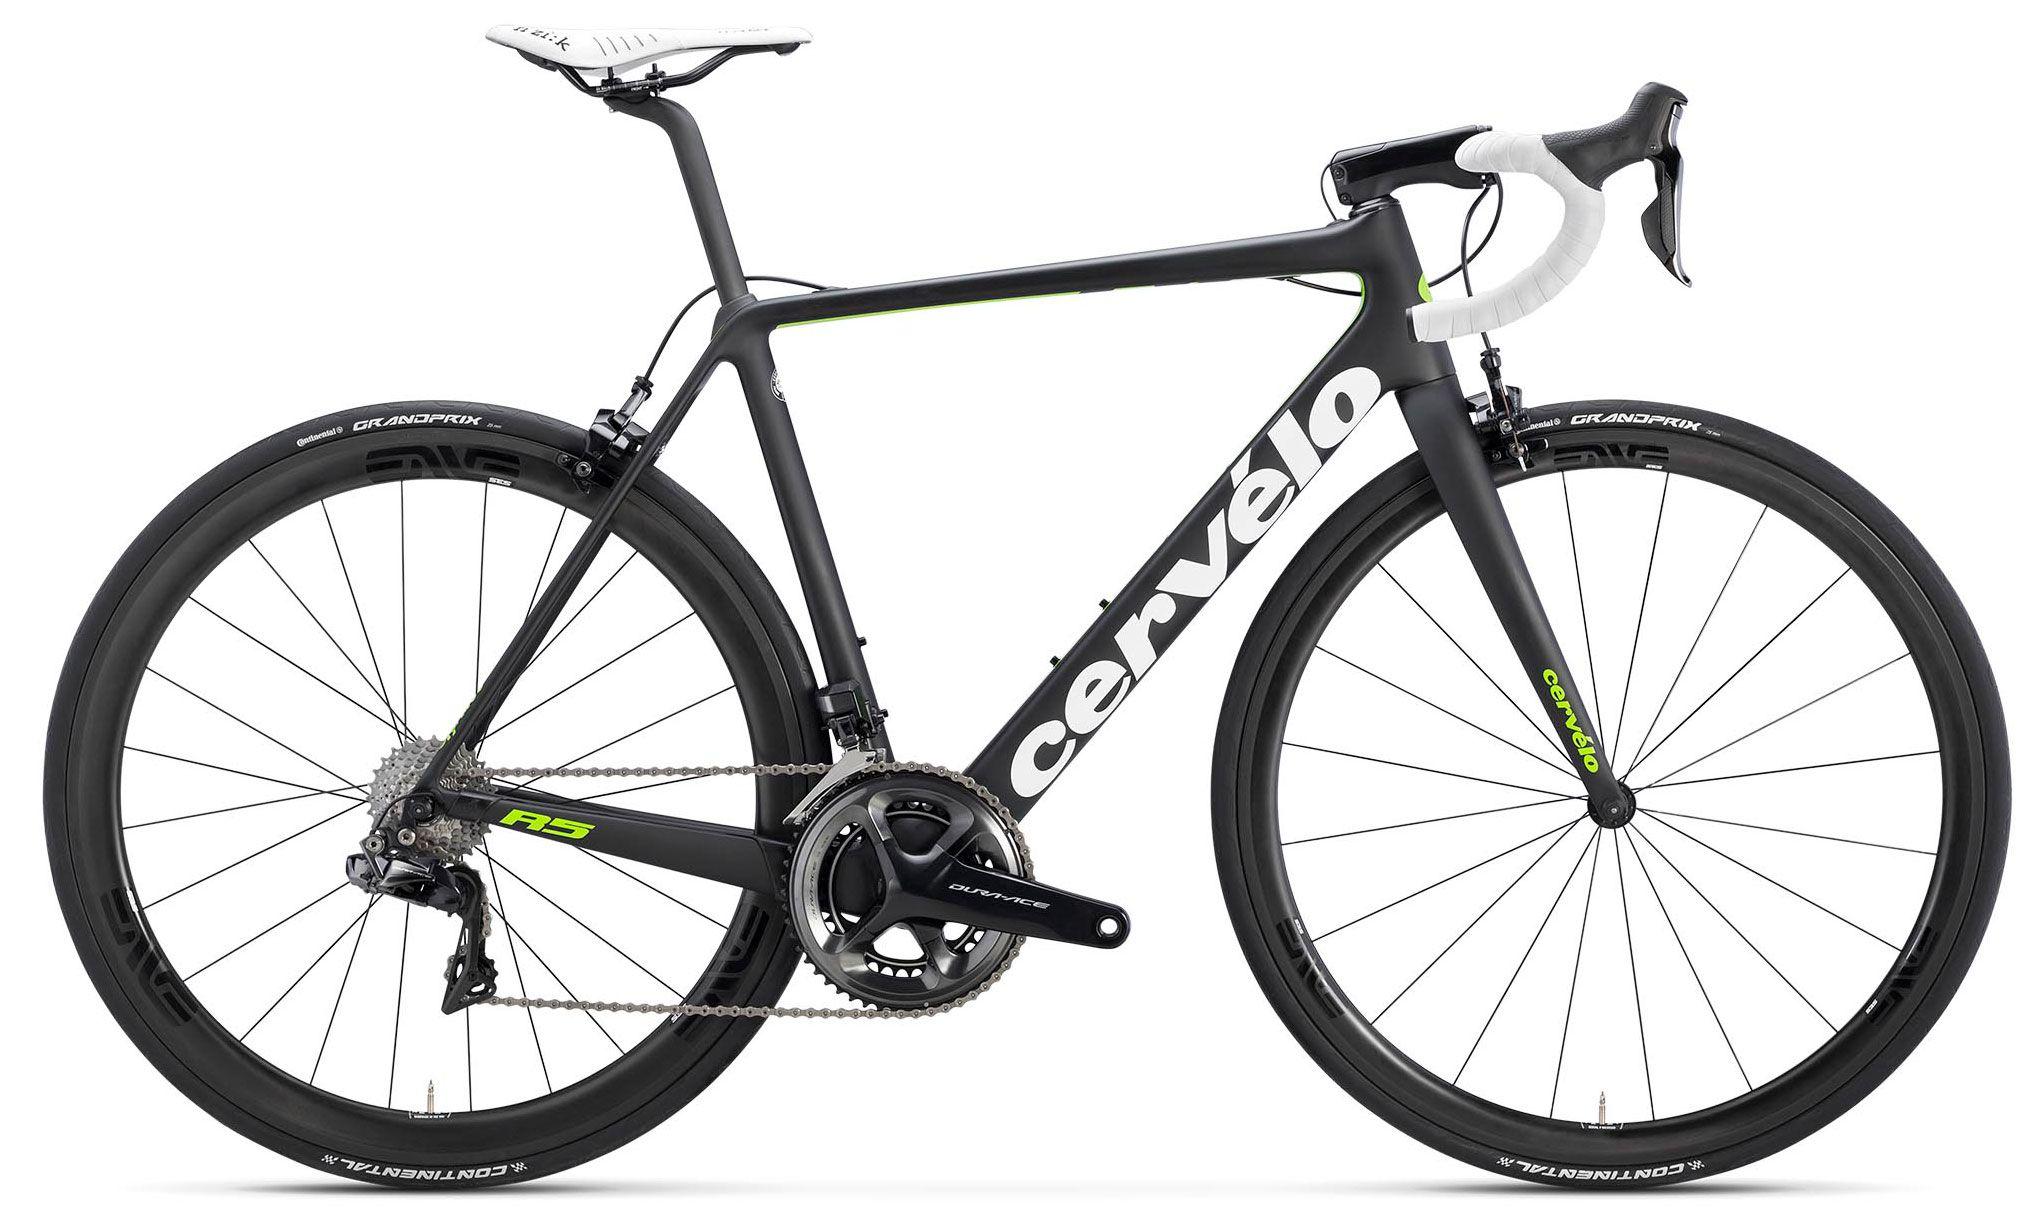 Велосипед Cervelo R5 DA Di2 2018 велосипед cervelo s3 ultegra 2018